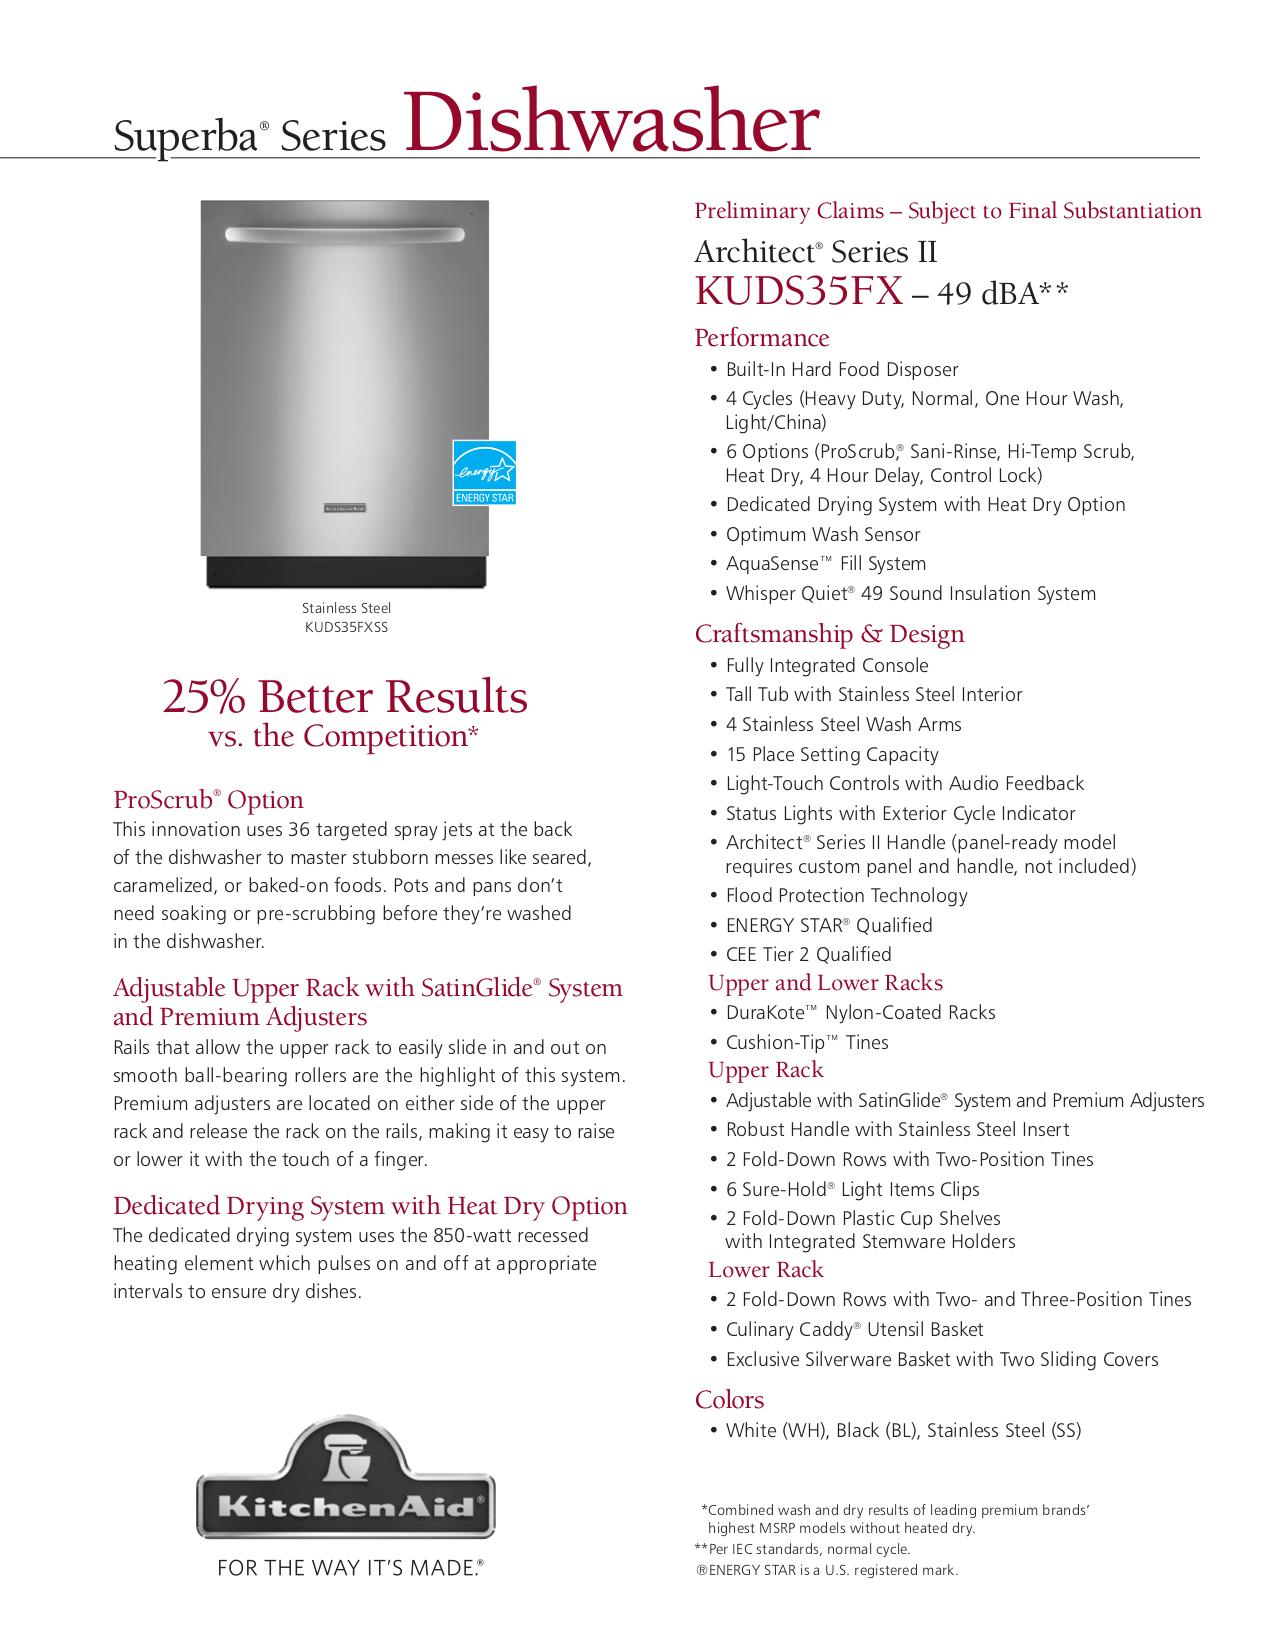 Download Free Pdf For Kitchenaid Kuds35fxss Dishwasher Manual Manual Guide